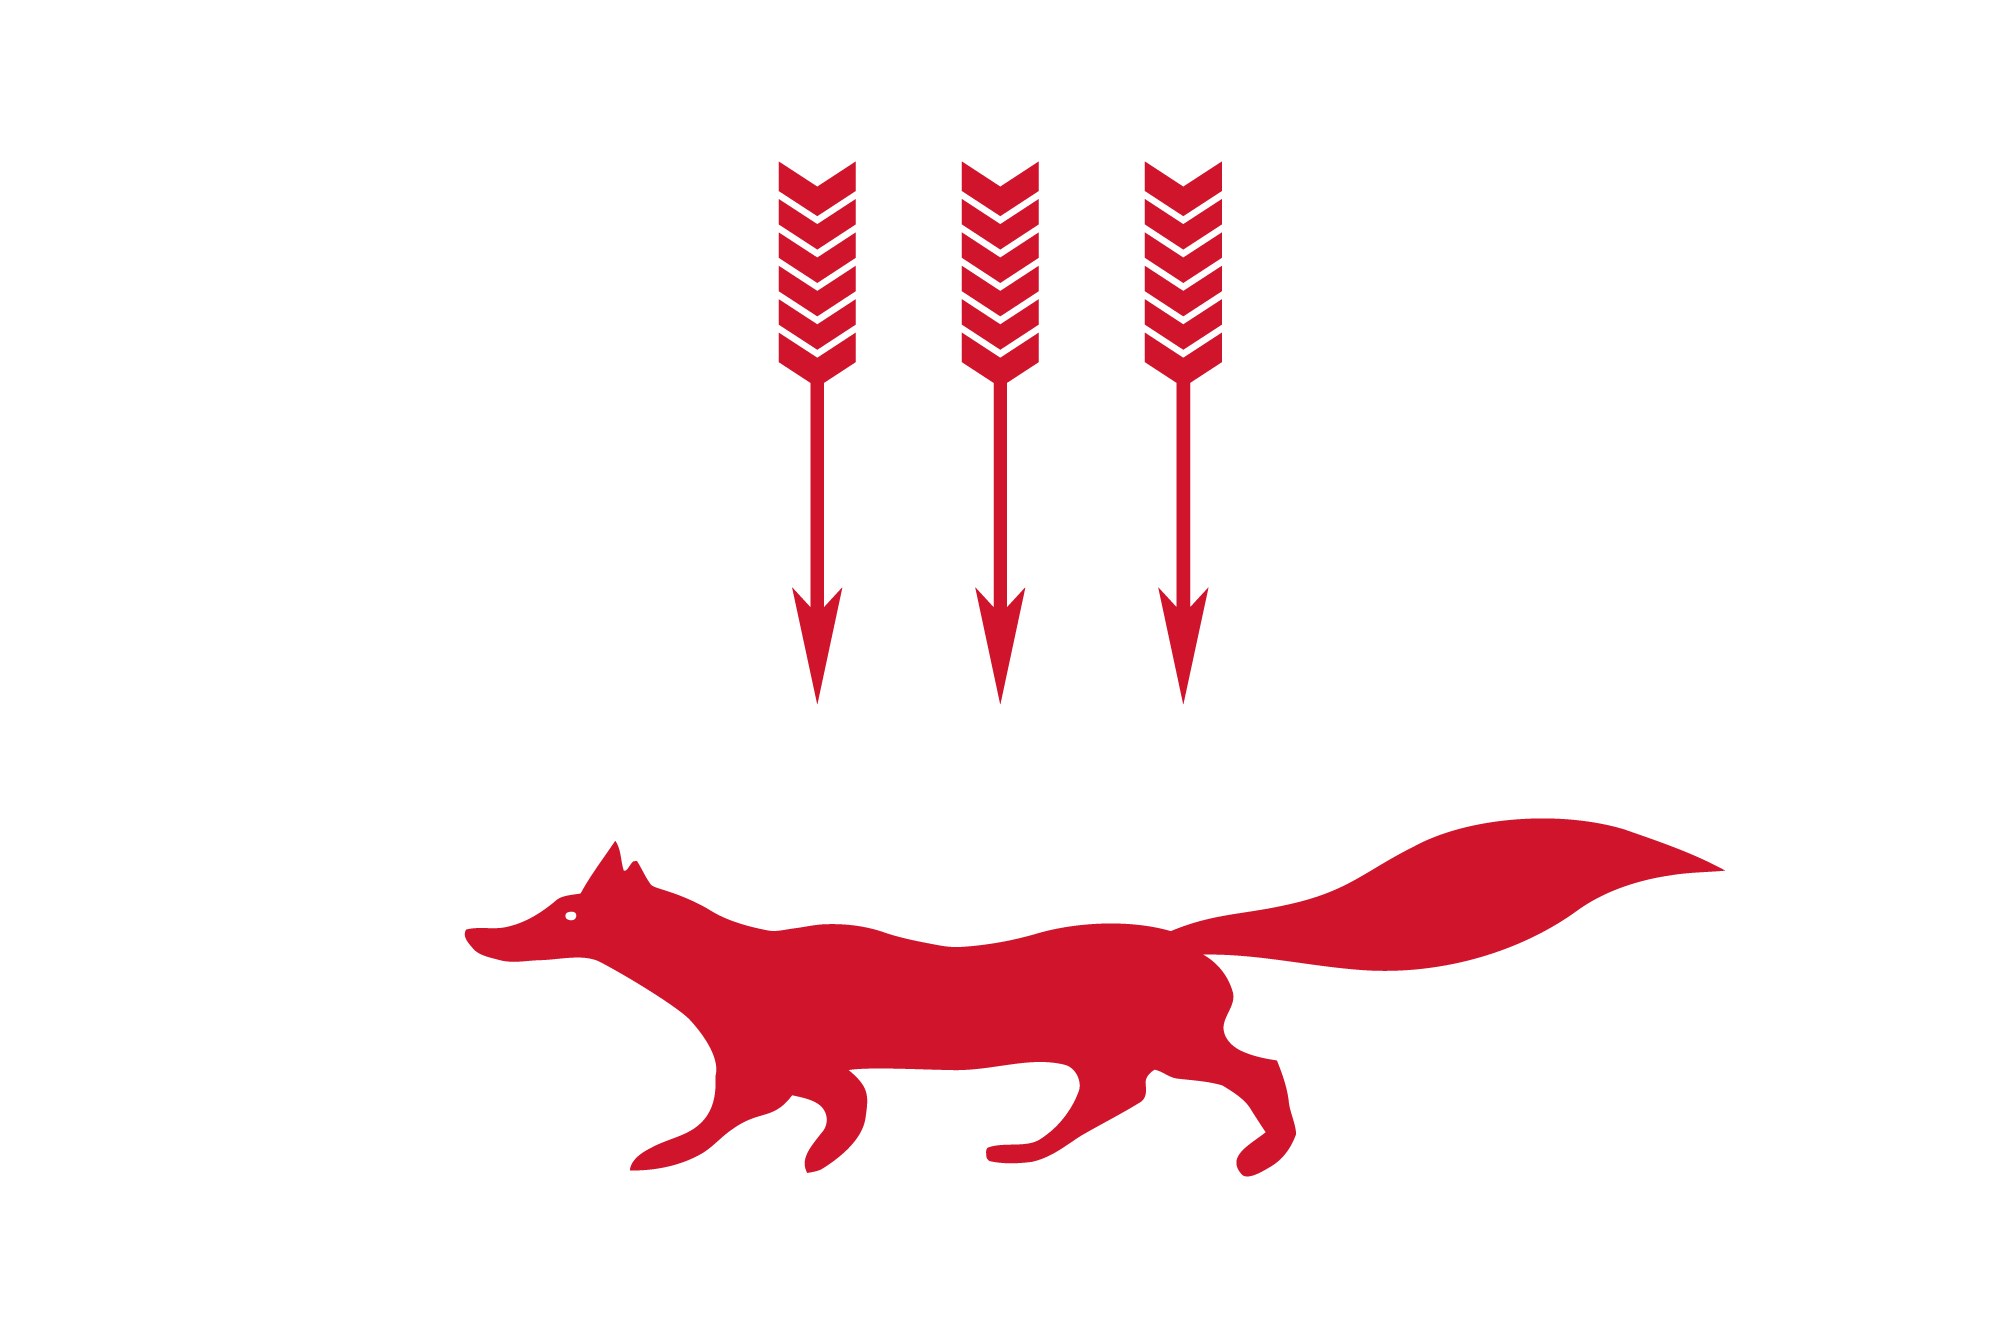 флаг города Саранск